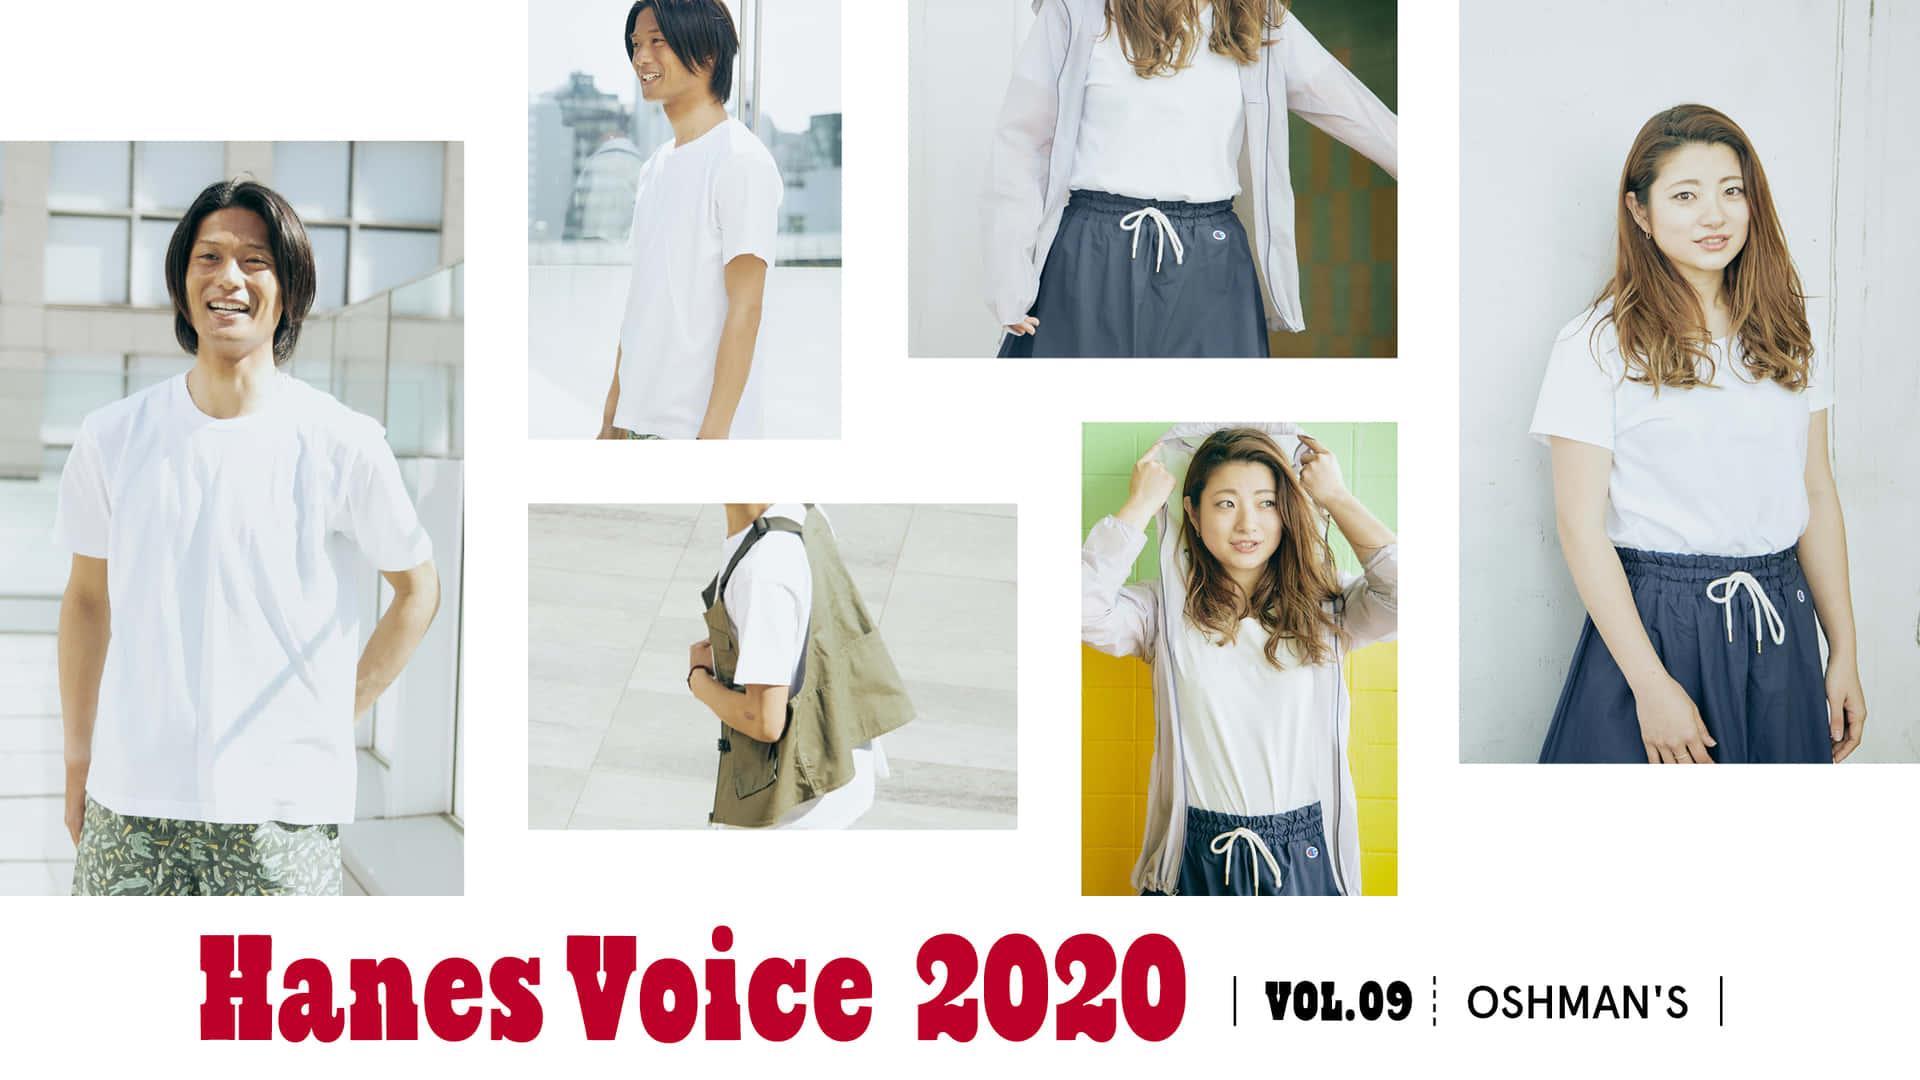 Hanes Voice 2020 vol.9「OSHMAN'S」